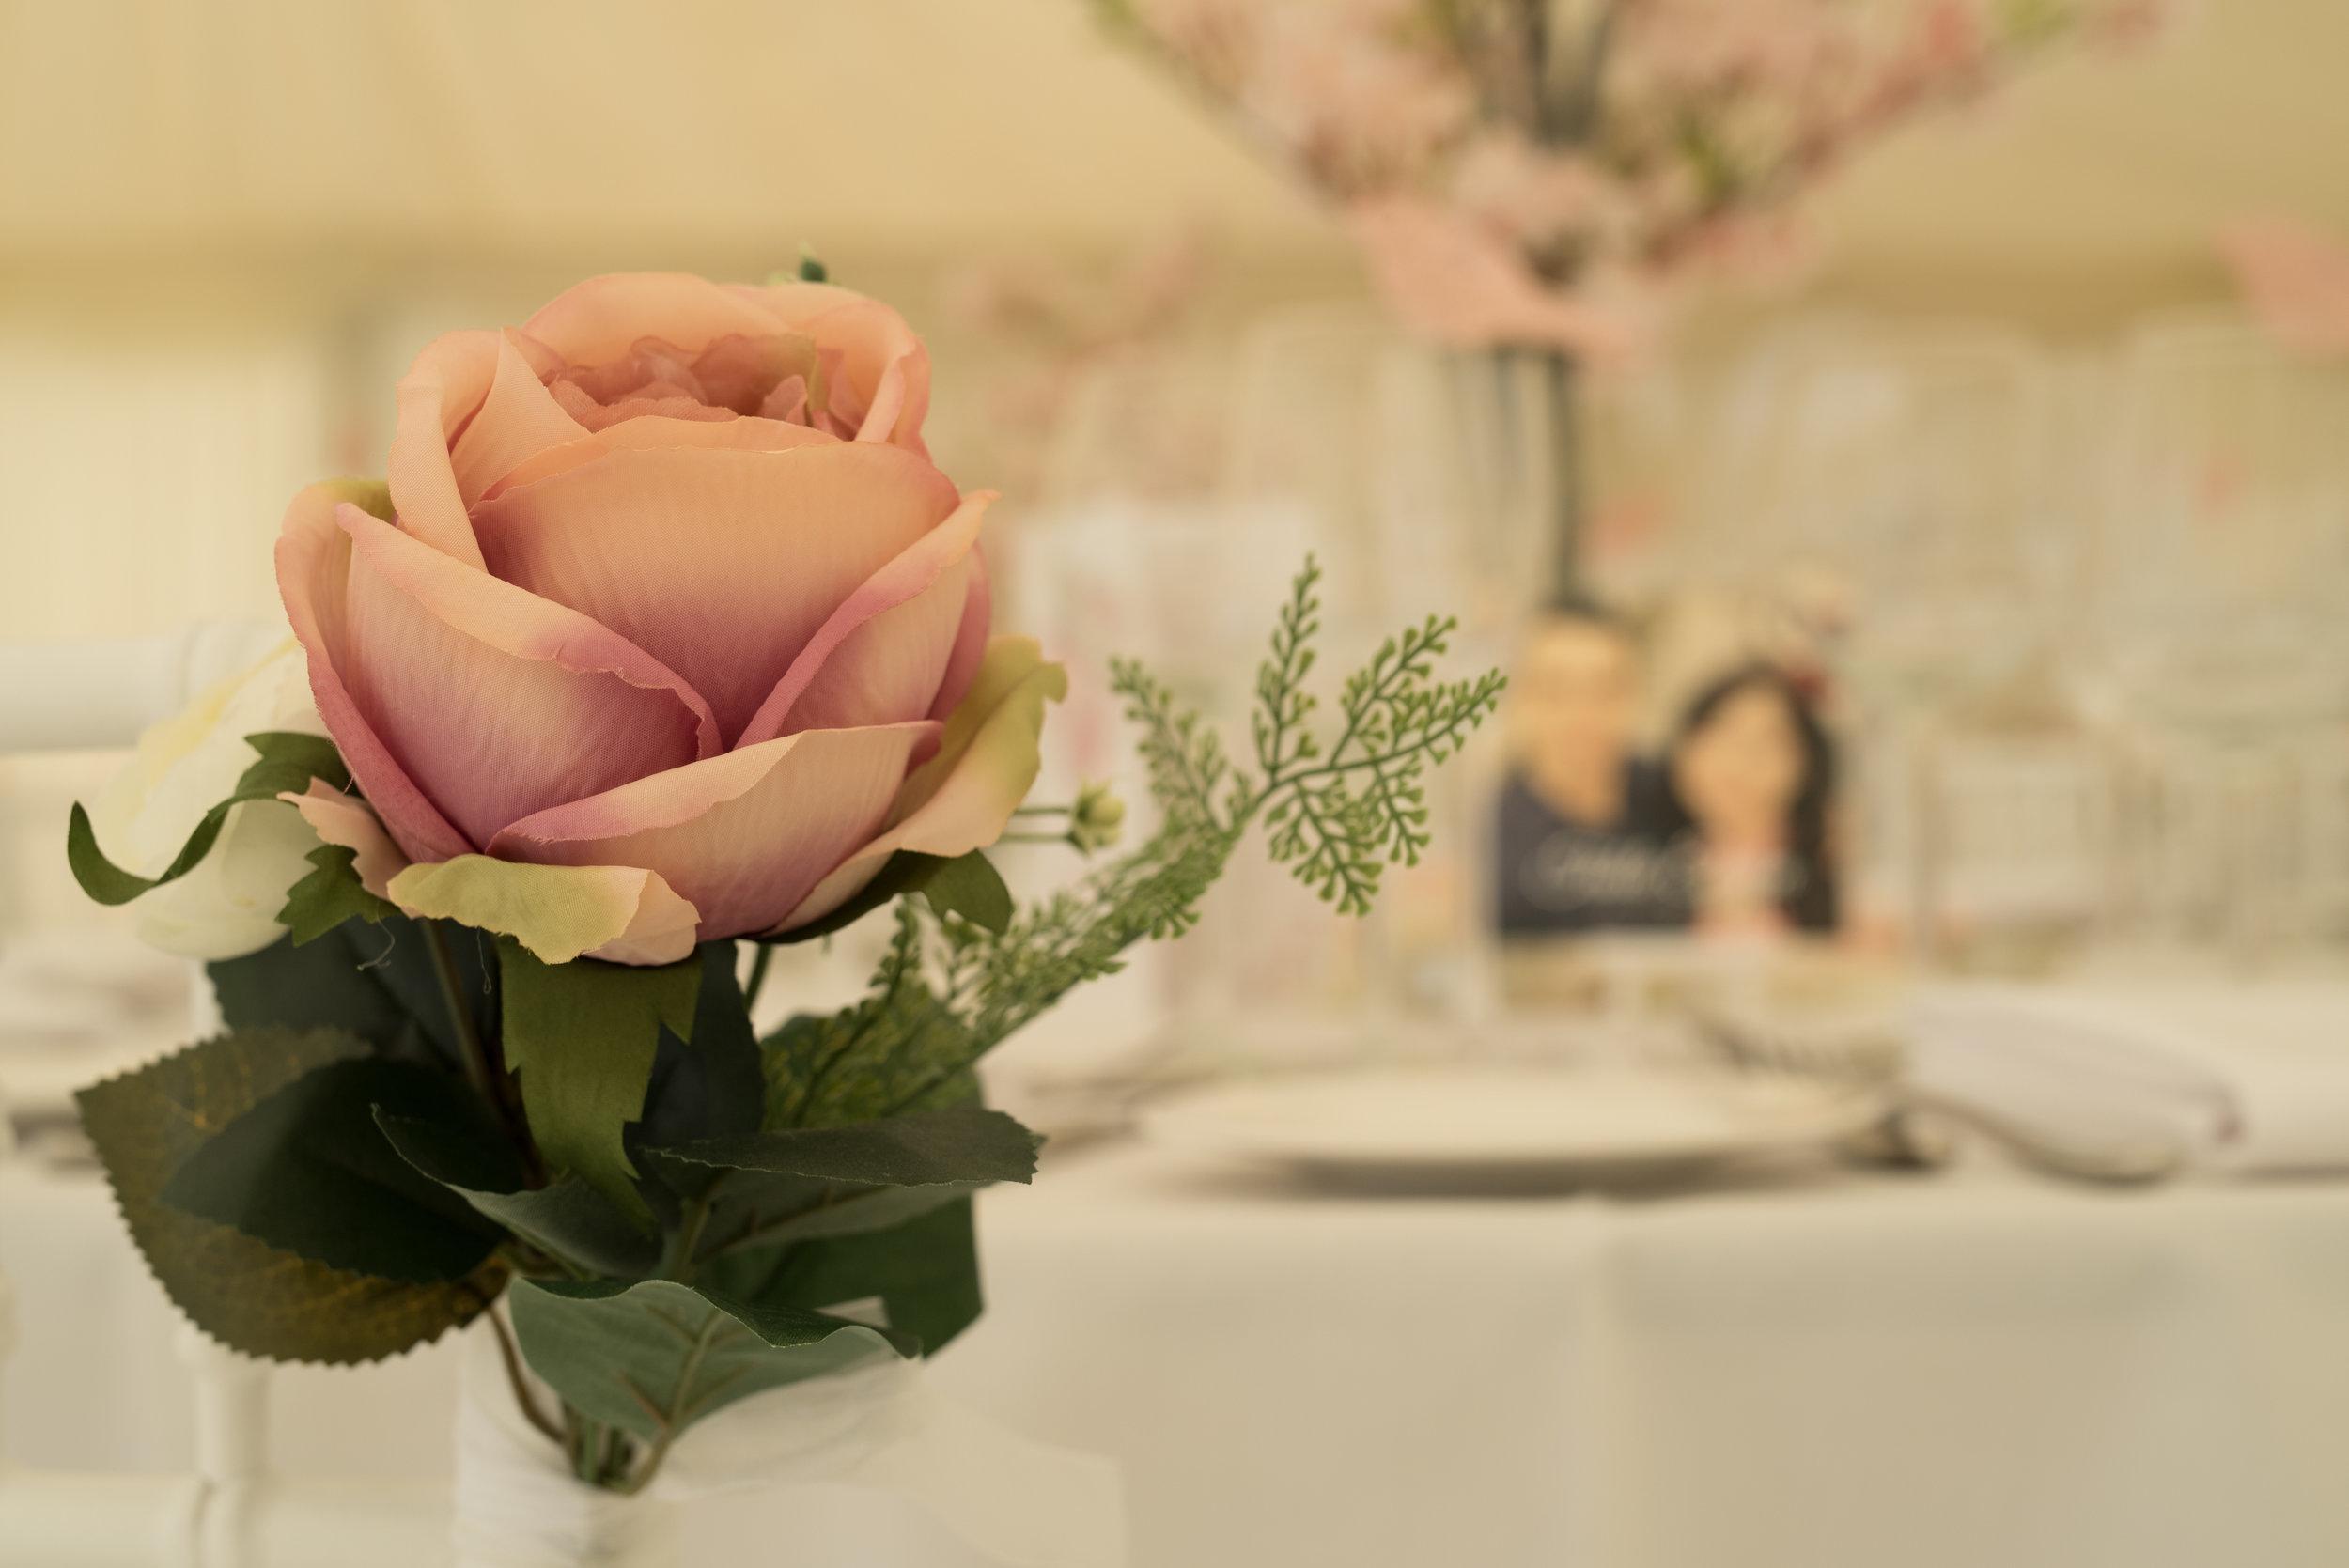 Danesfield House wedding, Danesfield House wedding photographer, Danesfield House wedding photography, High Wycombe wedding, Marlow wedding, wedding table decorations